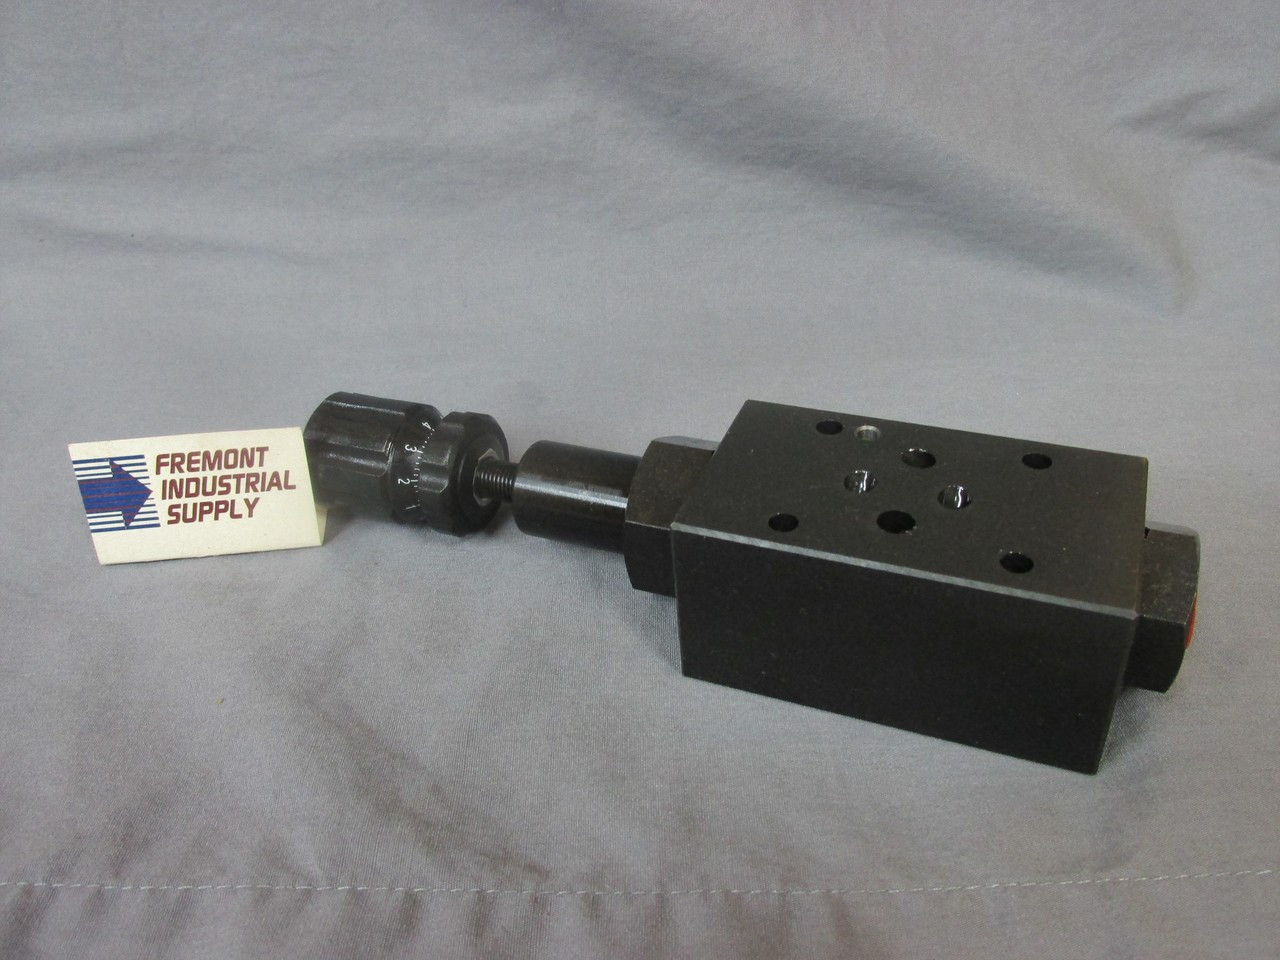 (Qty of 1) D05 Modular hydraulic counterbalance valve 1000-3000 PSI adjustment range  Power Valve USA